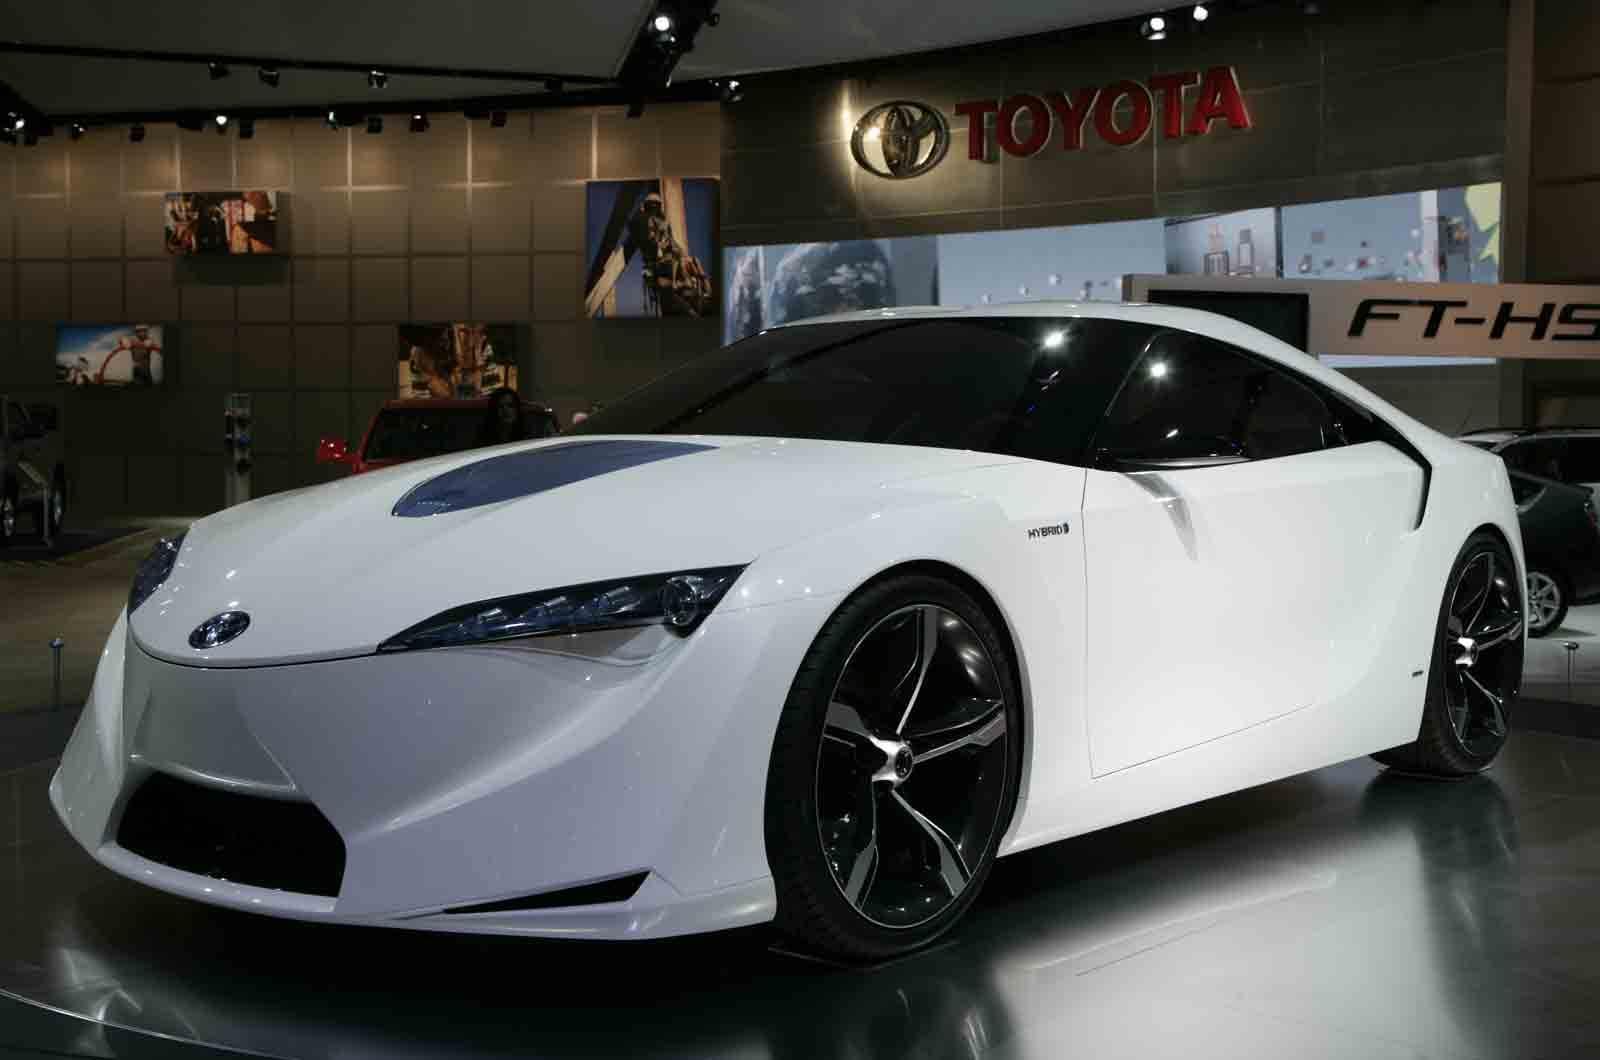 Toyota to showcase Supra concept at Detroit